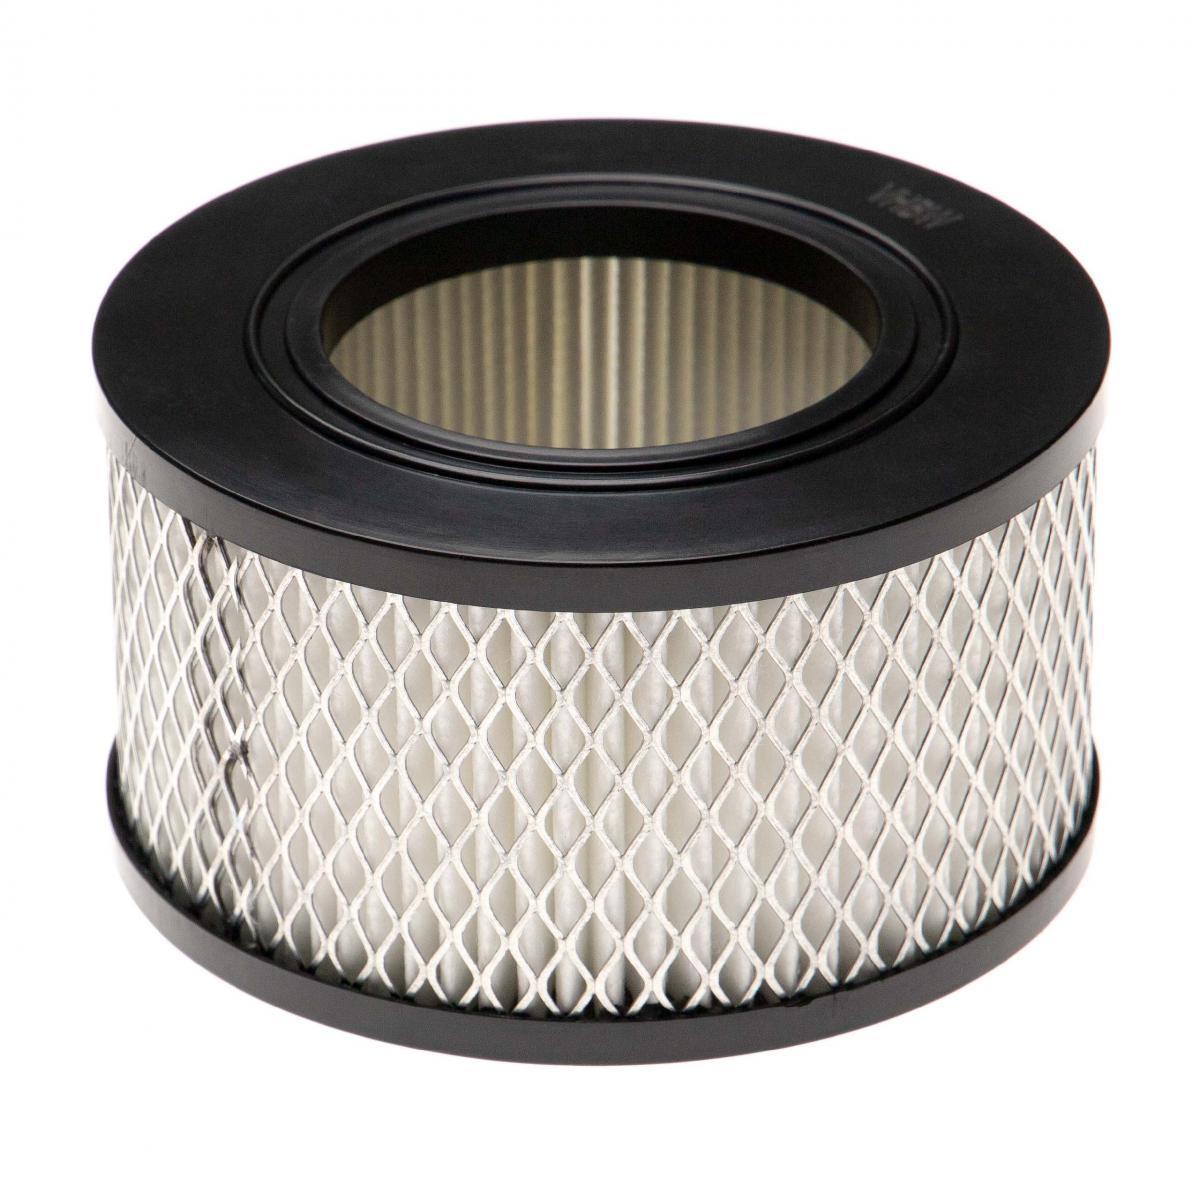 Vhbw vhbw Filtre compatible avec Nilfisk Attix 33-2L IC, 33-01 IC, 33-2L IC Mobile, 33-2M, 33-2M PC aspirateur - filtre HEPA